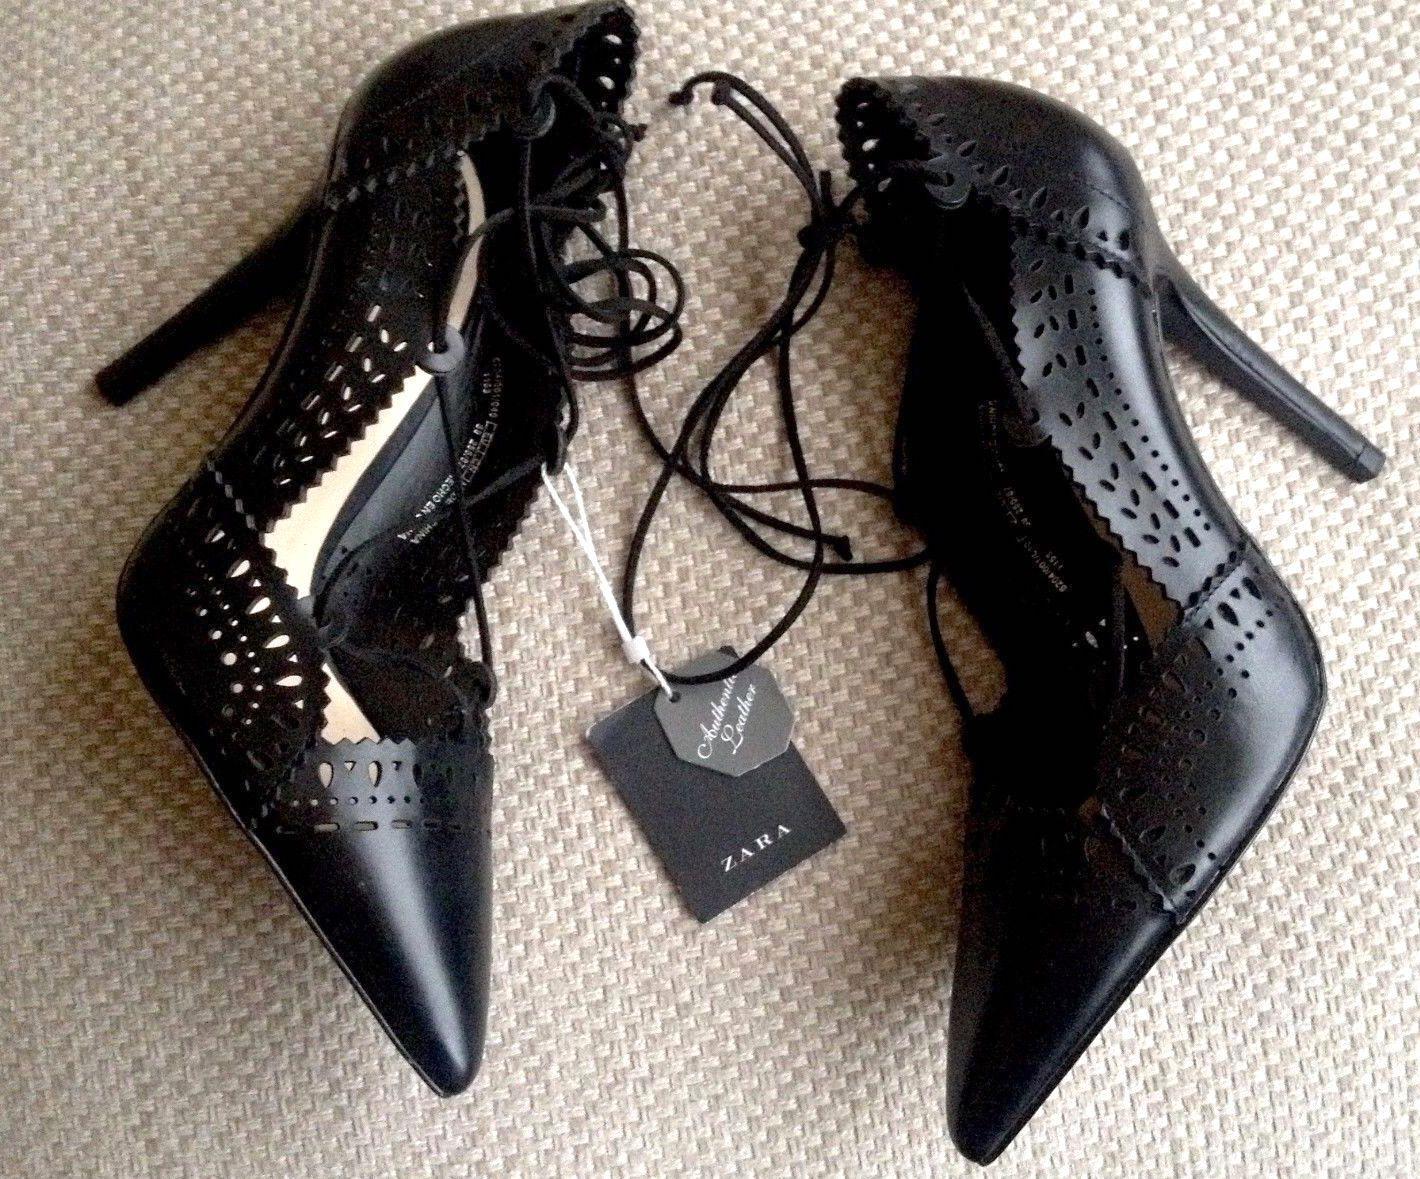 � ZARA Schuhe BLACK GENUINE LEATHER HIGH HEEL POINTED COURT Schuhe ZARA ANKLE Stiefel NEW 6880f7